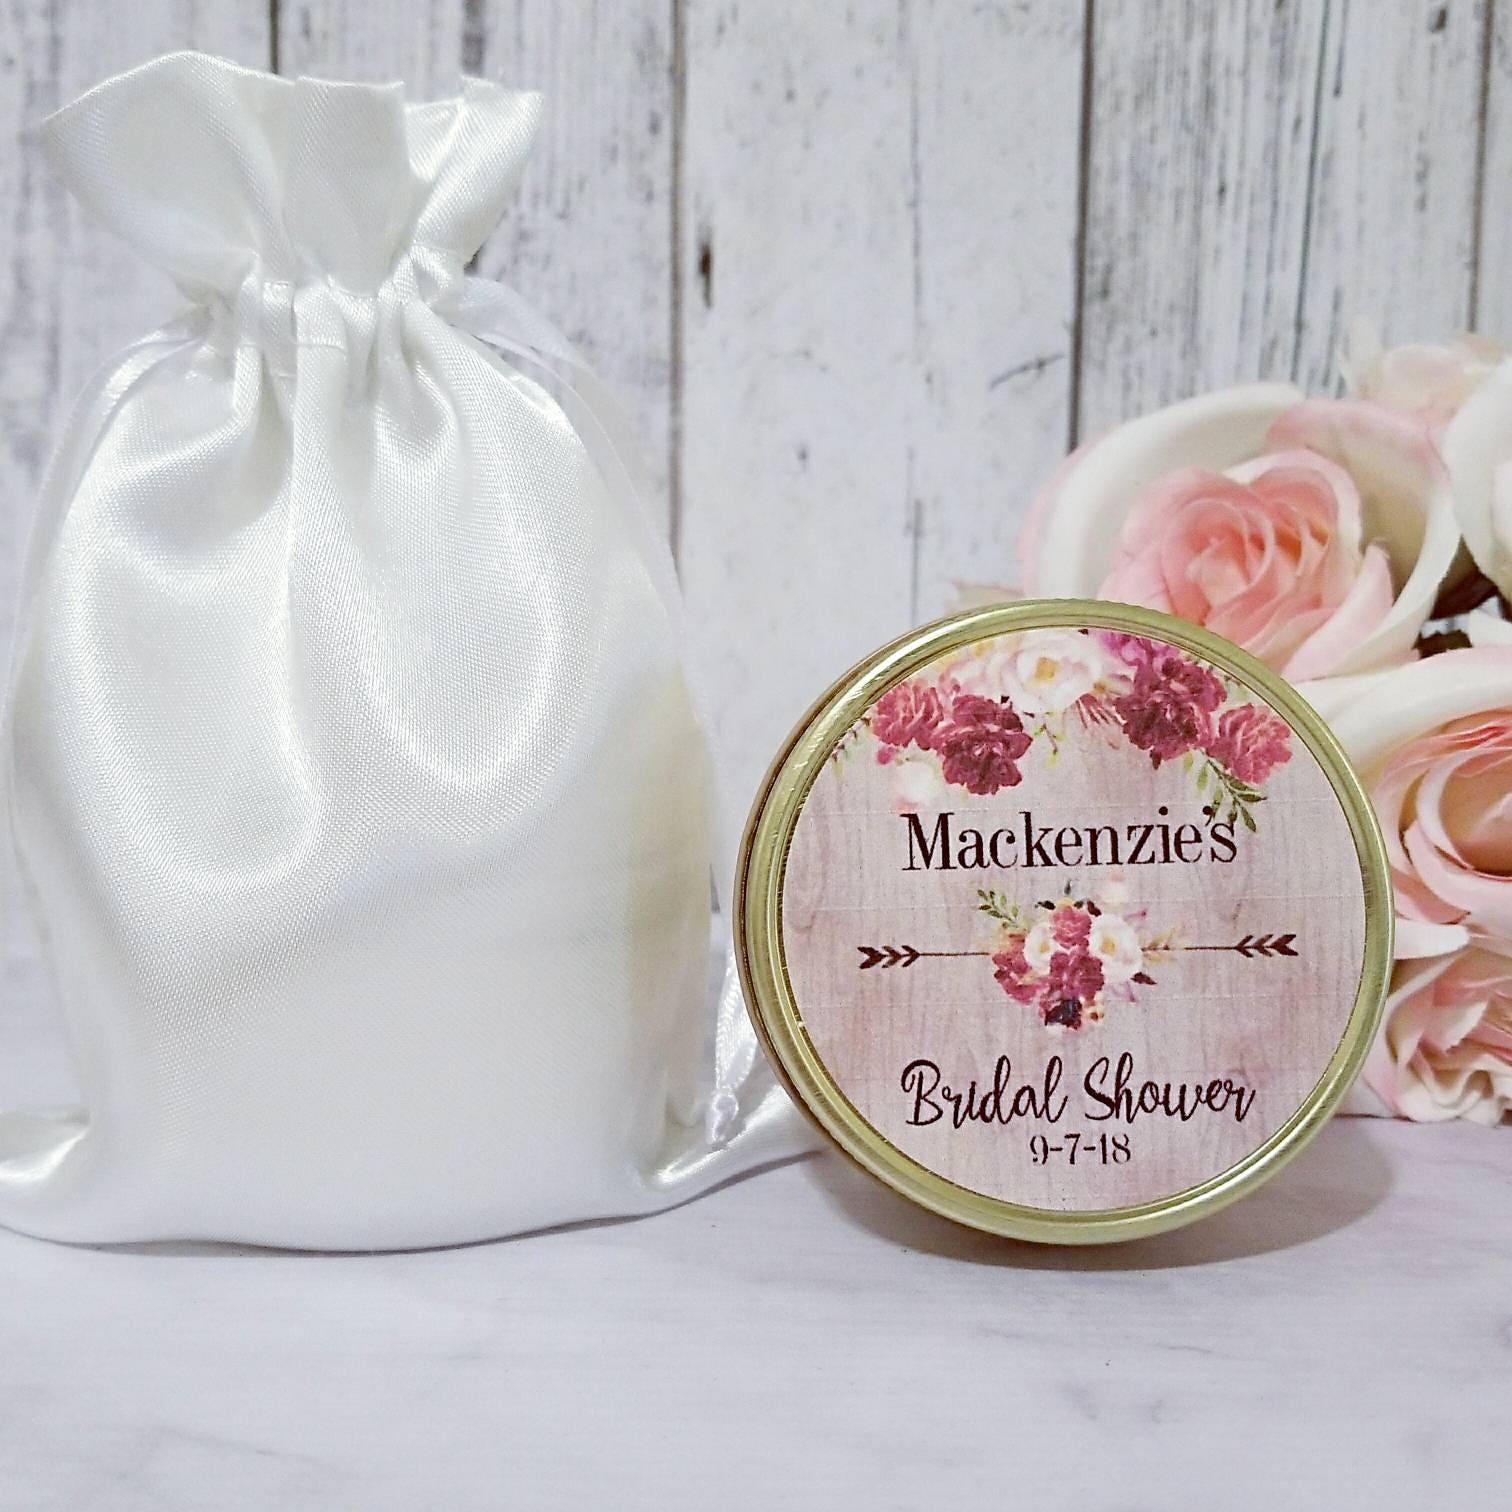 Rustic Bridal Shower Favors Candles - Rustic Bridal Shower - Rustic ...